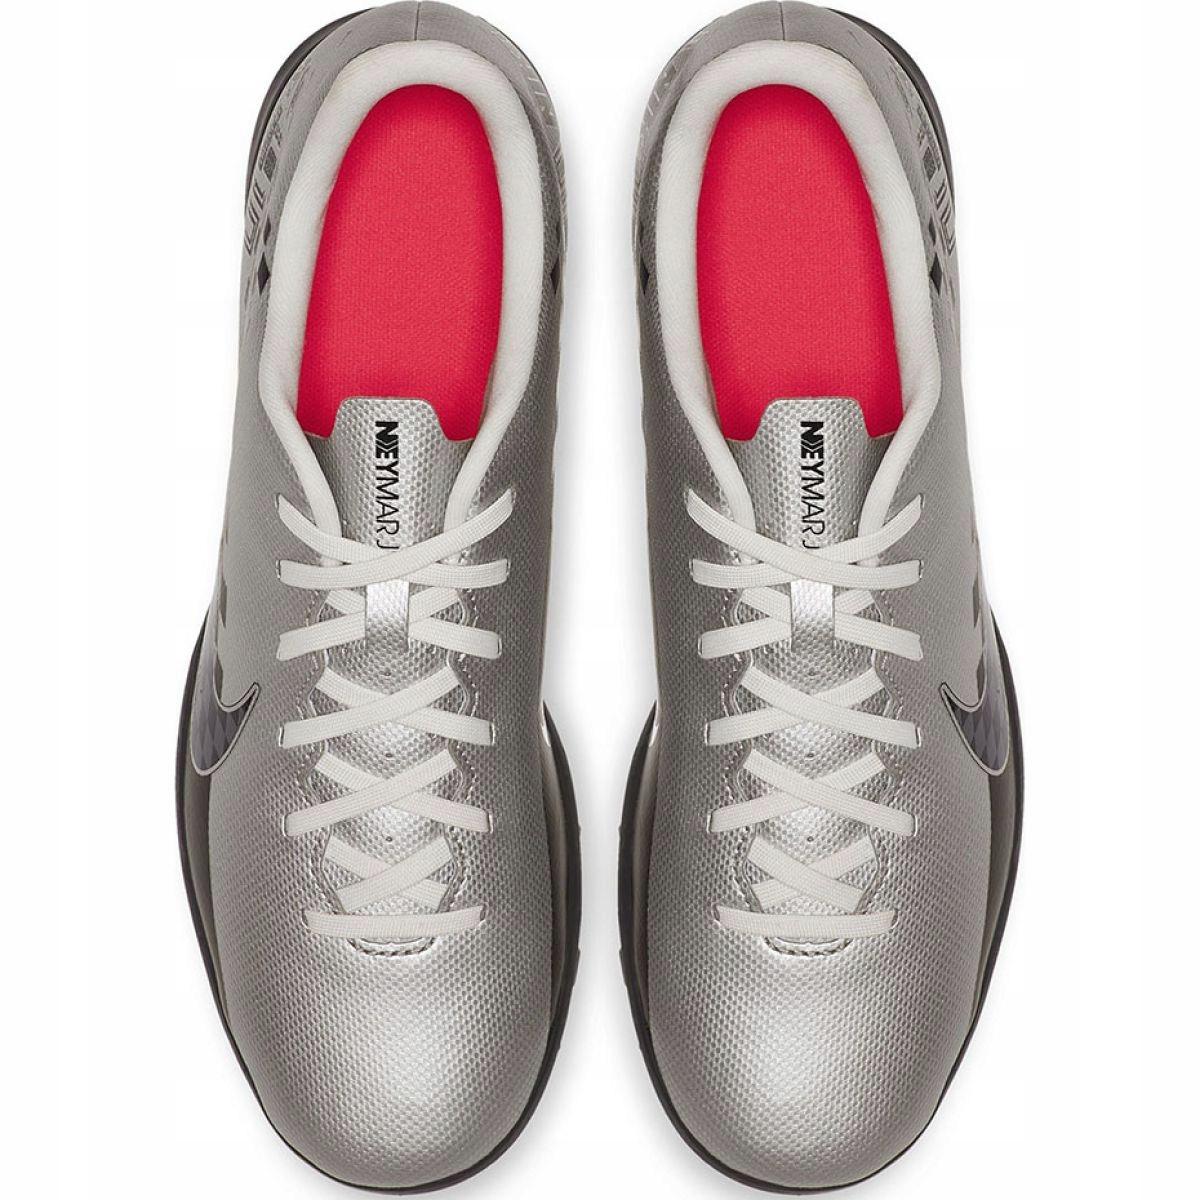 Chuteiras de futebol Nike Mercurial Vapor 13 Club Neymar Tf M AT8000 006 prata cinza prata